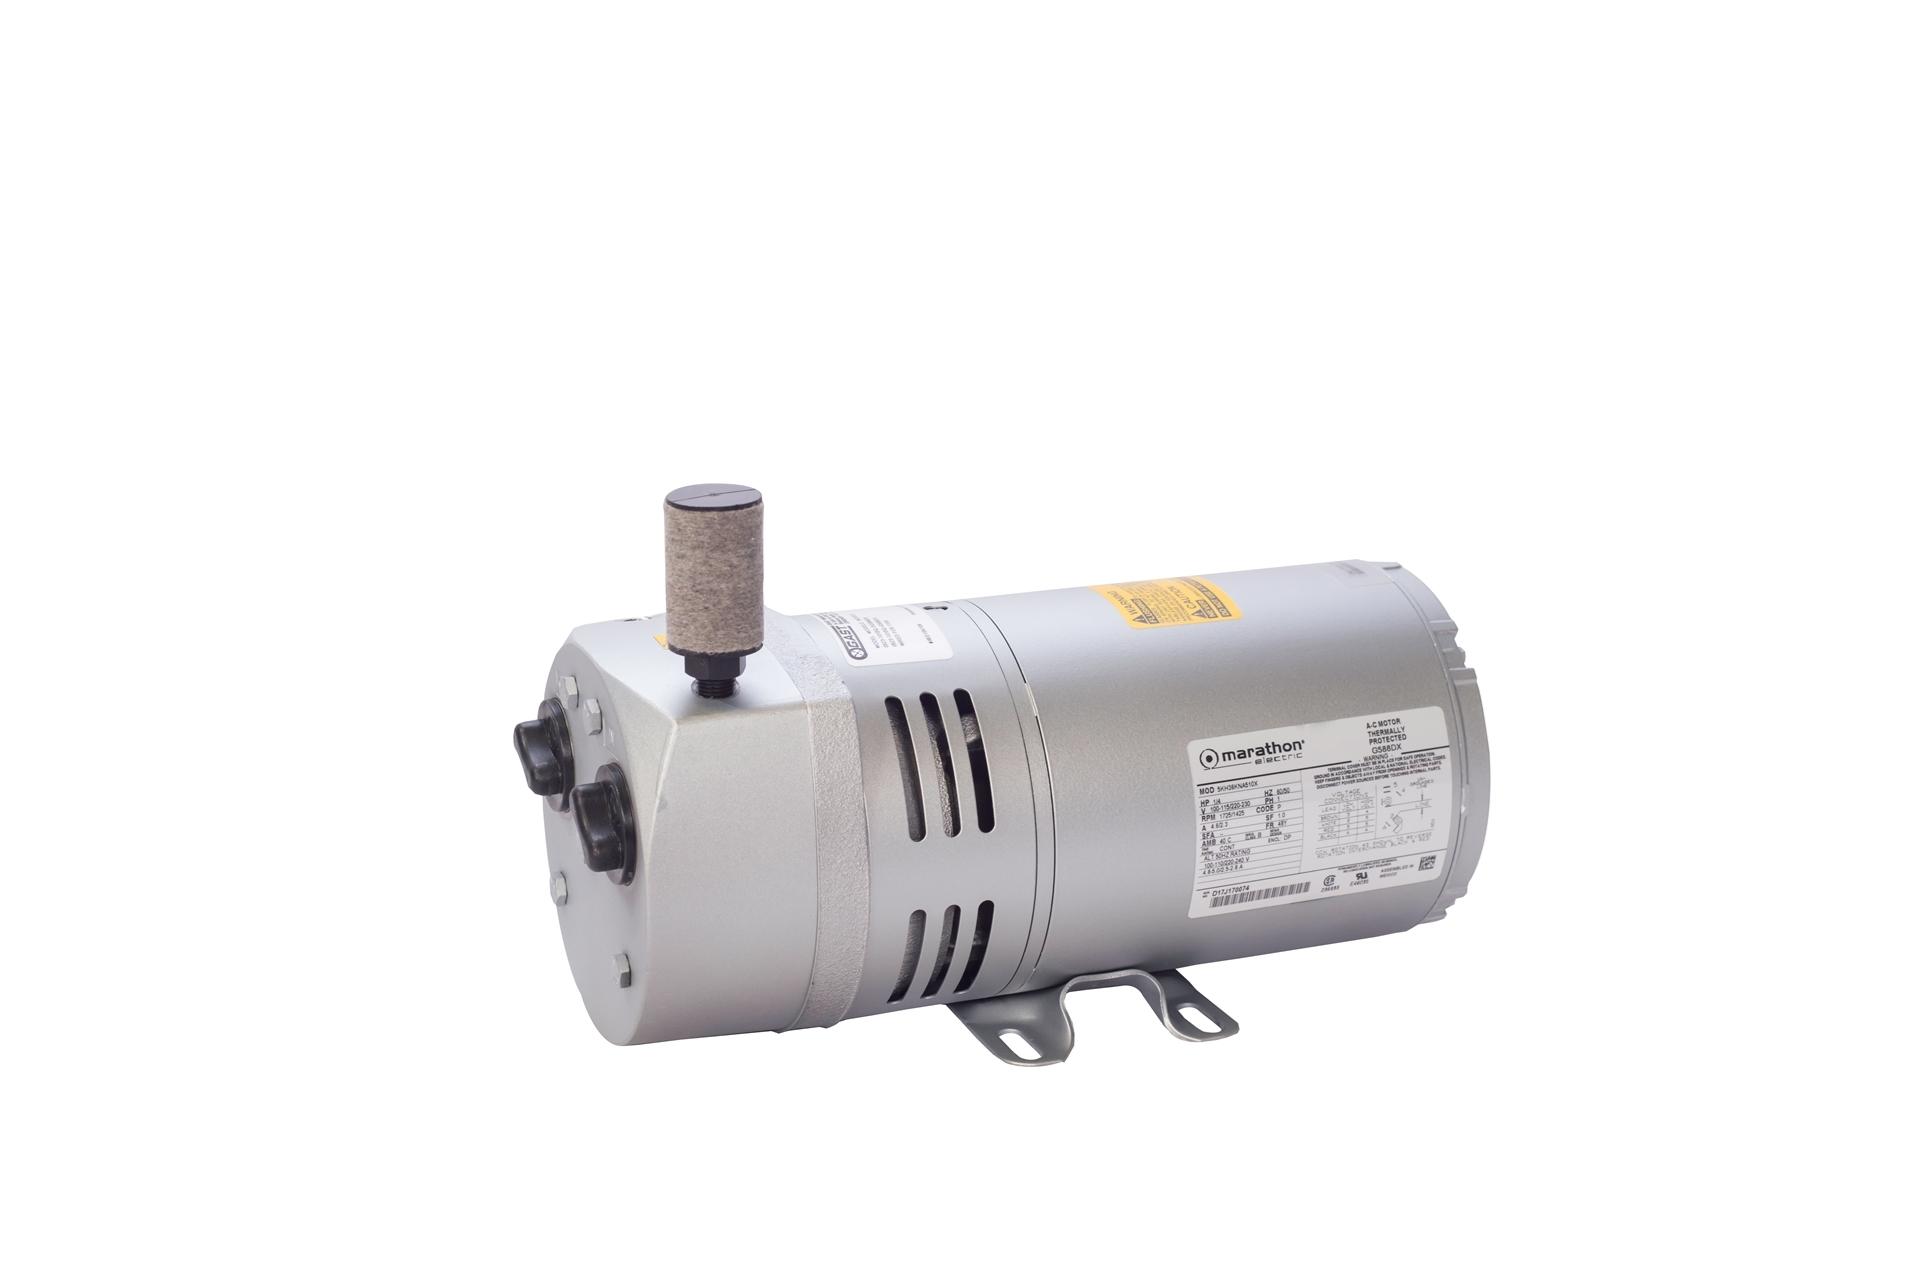 Gast 0523 Rotary Vane Air Compressor Septic Tank Parts